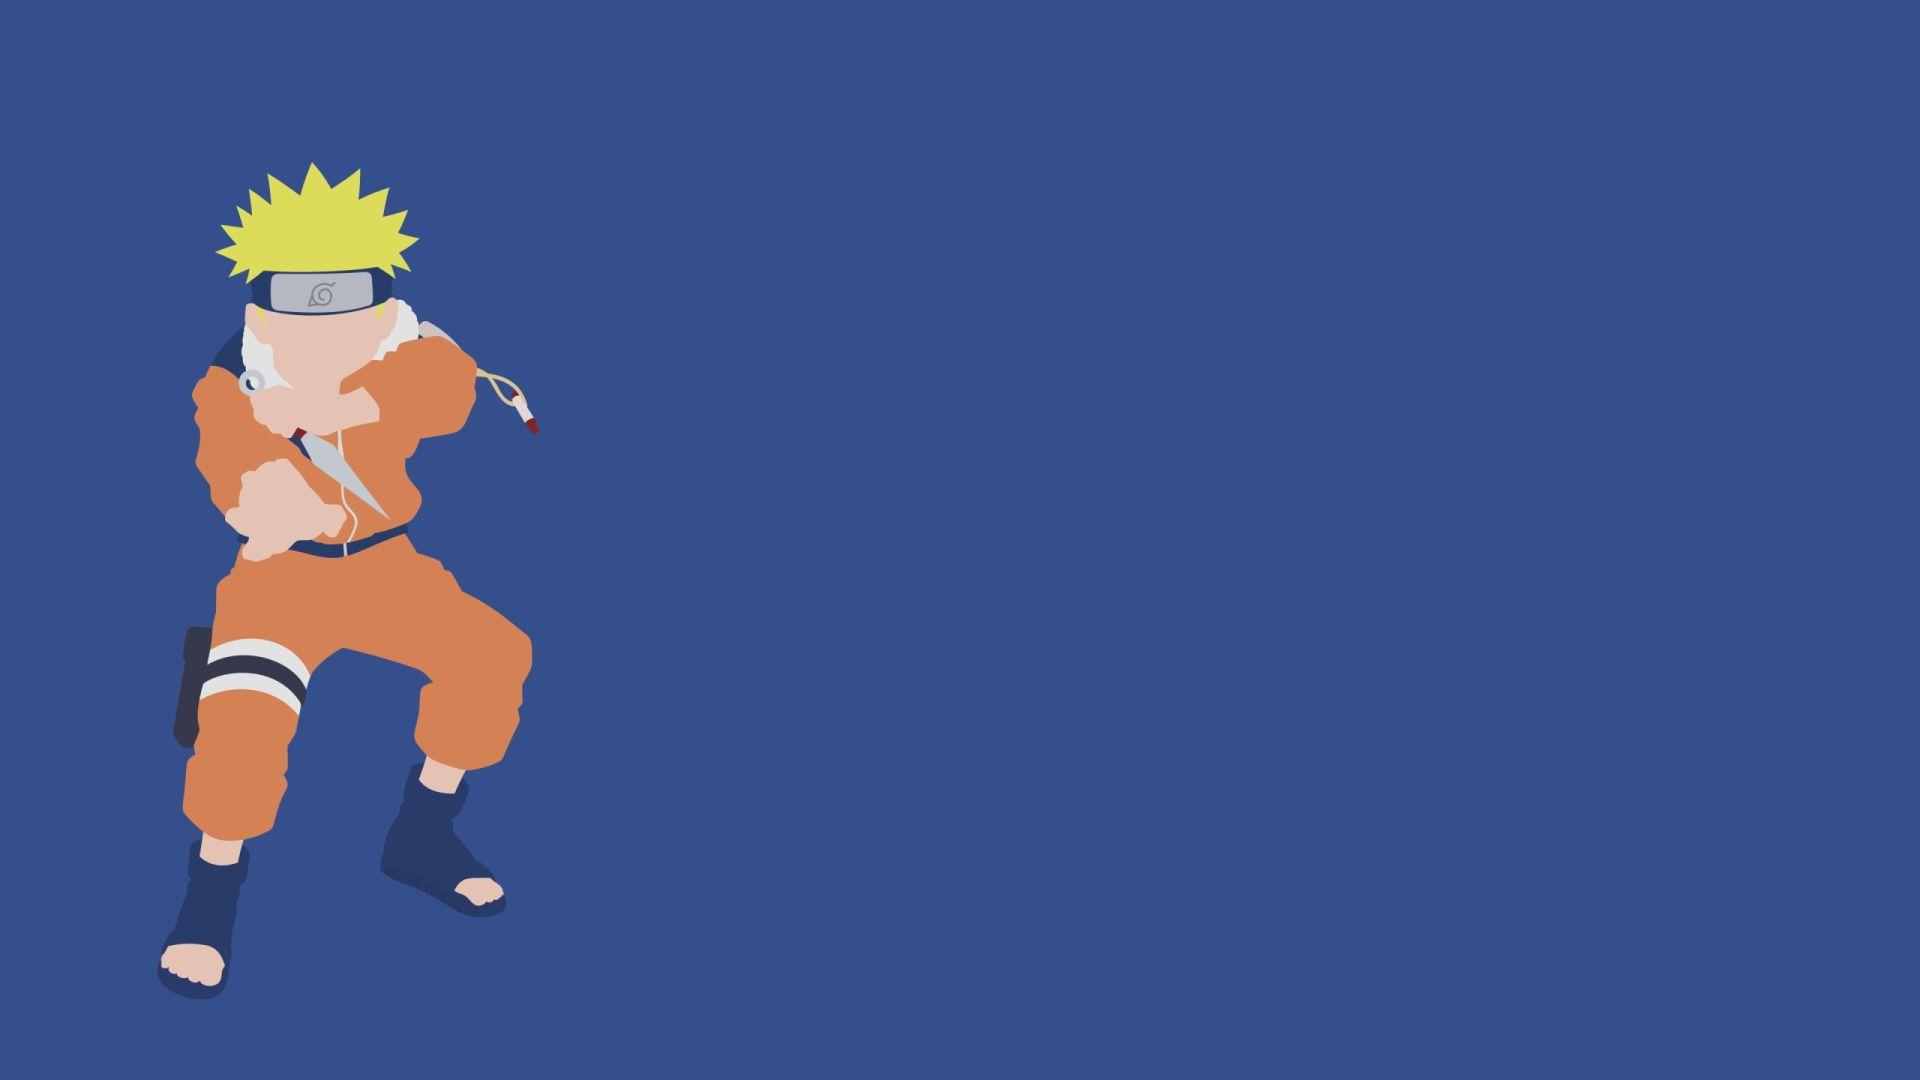 Naruto Minimalist, Free Wallpaper and Background